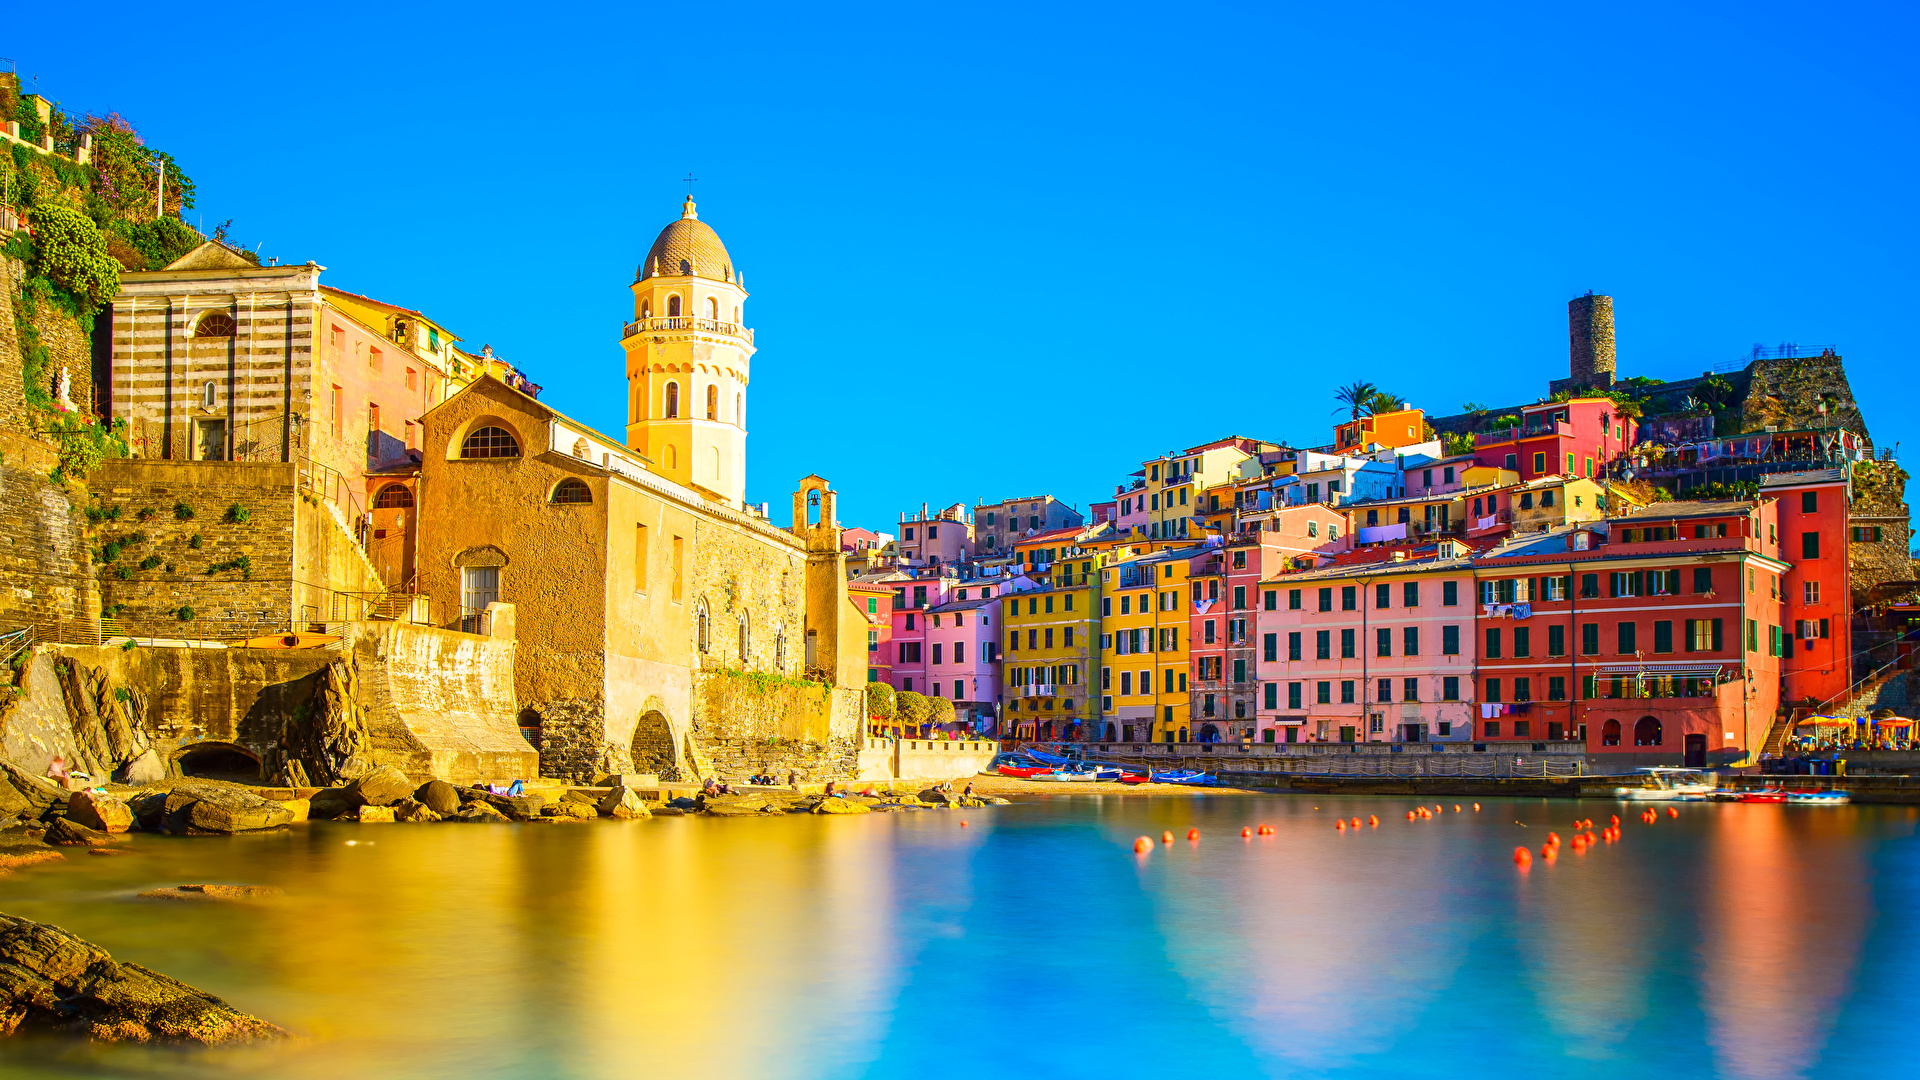 Images Liguria Vernazza Cinque Terre park Italy Sea Cities 1920x1080 1920x1080